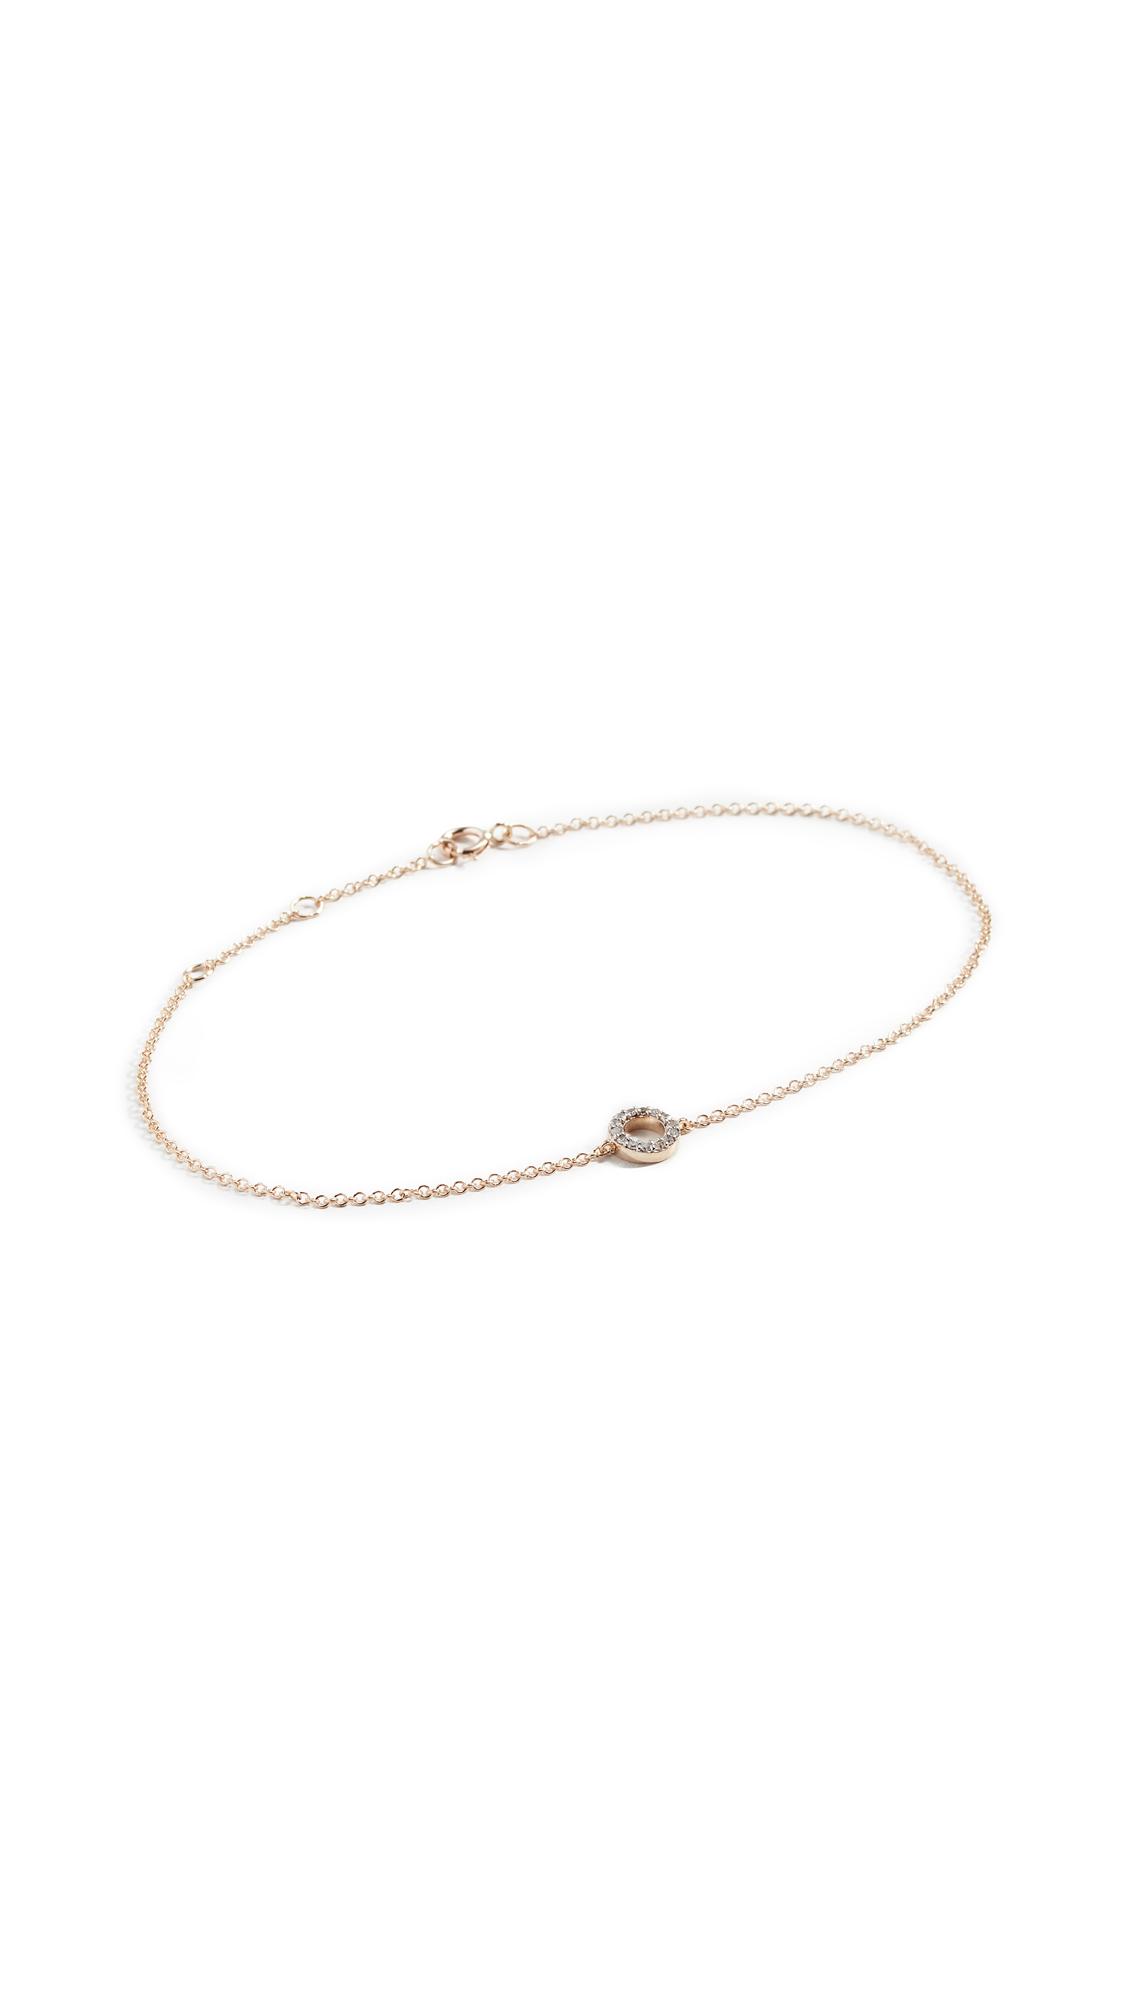 MATEO 14K Mini Diamond Circle Bracelet in Yellow Gold